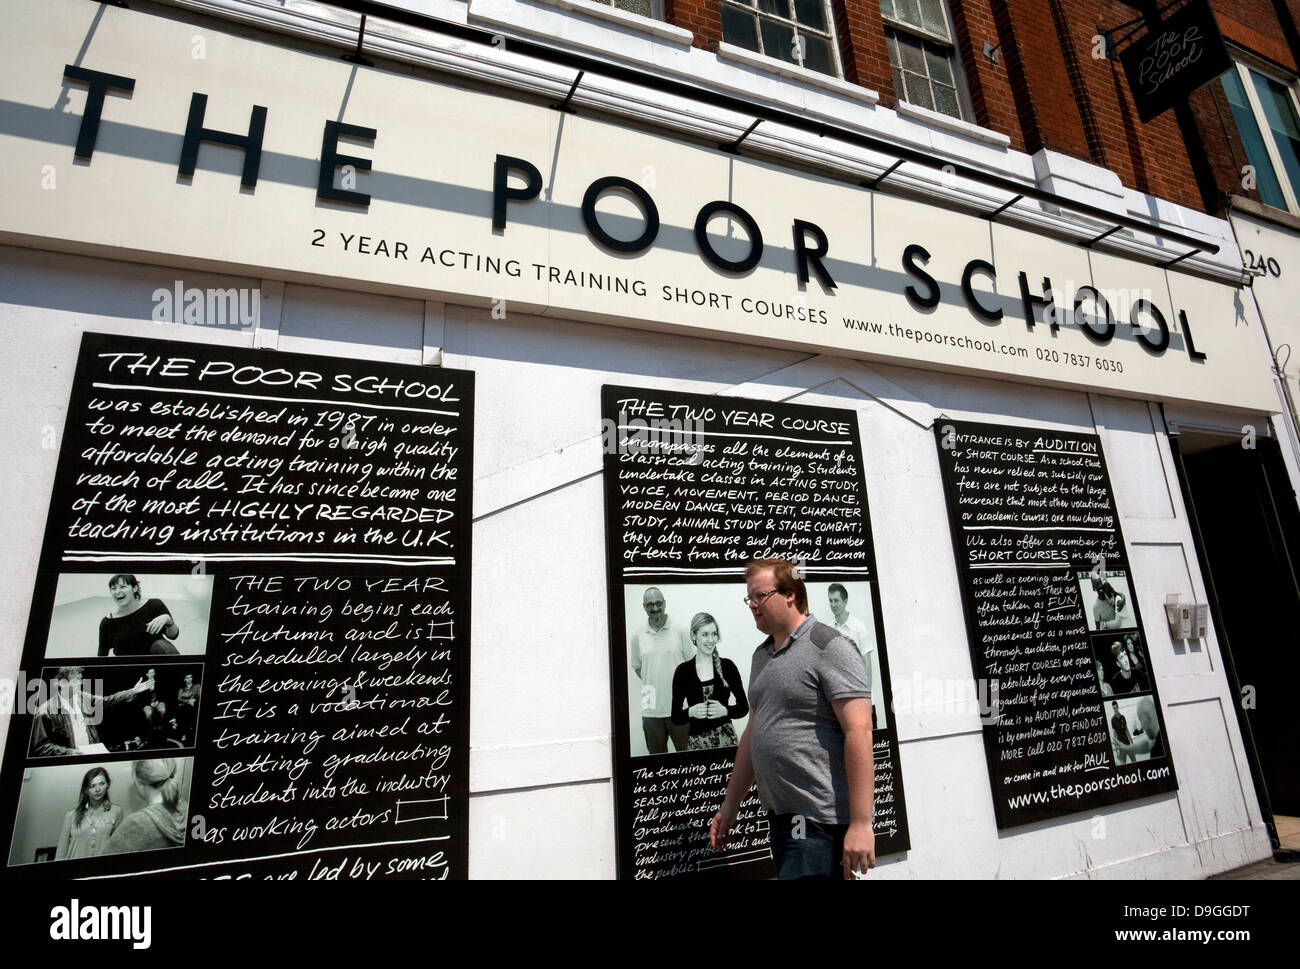 The Poor School stage school in Kings Cross, London - Stock Image